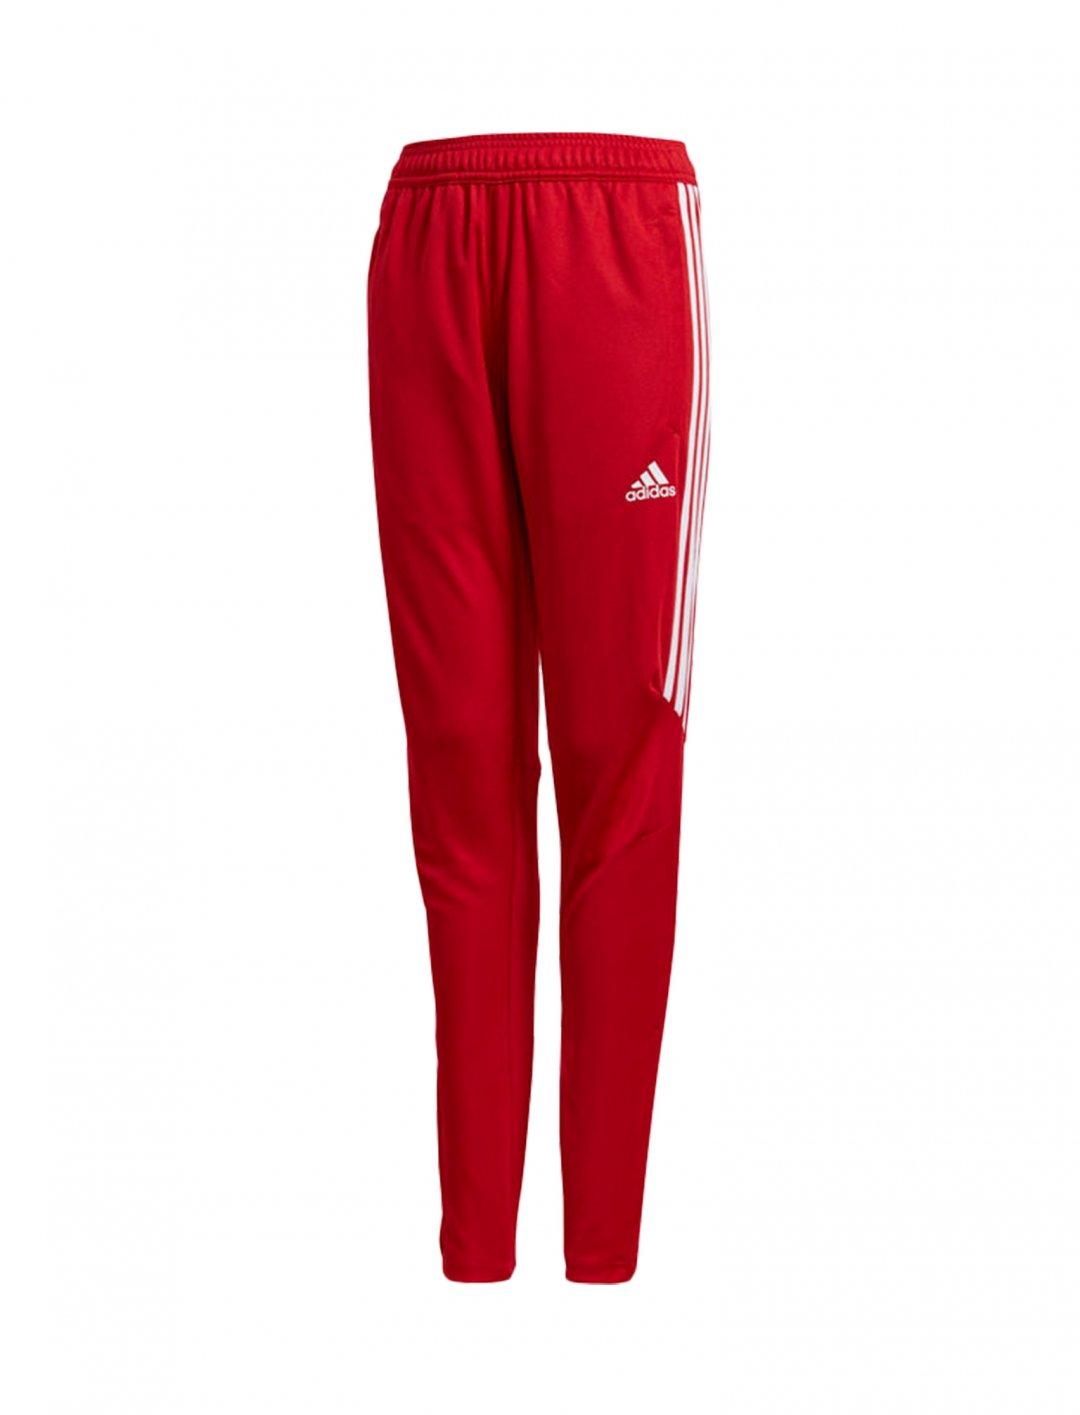 "Adidas Training Pants {""id"":5,""product_section_id"":1,""name"":""Clothing"",""order"":5} Adidas"